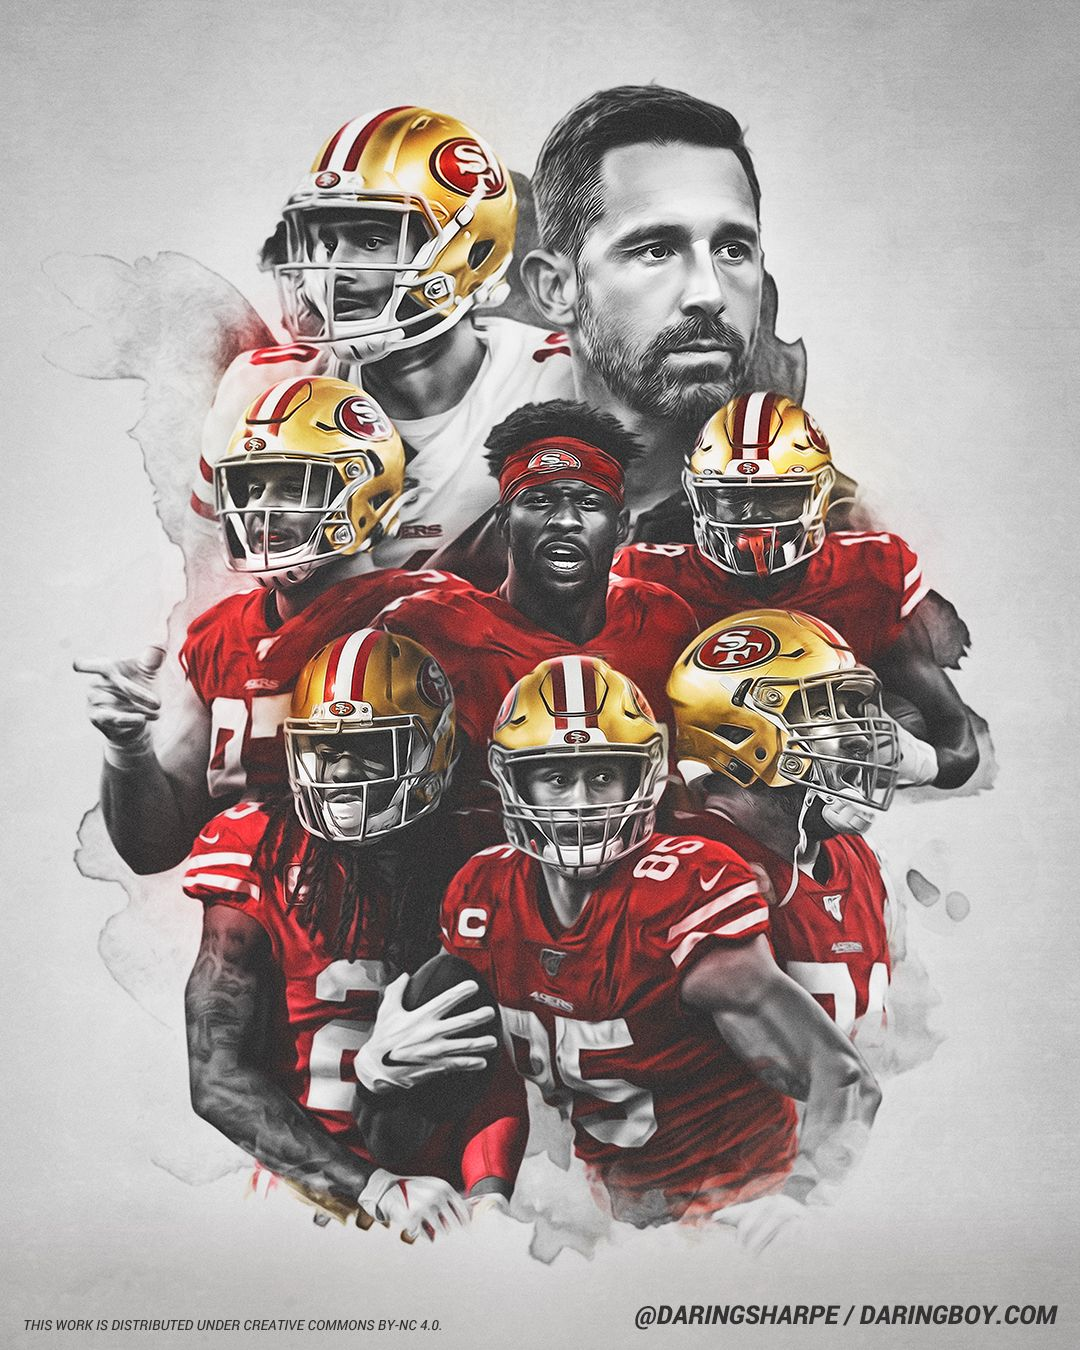 Kyle Shanahan Deebo Samuel Joe Staley Emmanuel Sanders George Kittle Richard Sherman In 2020 Nfl Football 49ers San Francisco 49ers San Francisco 49ers Football